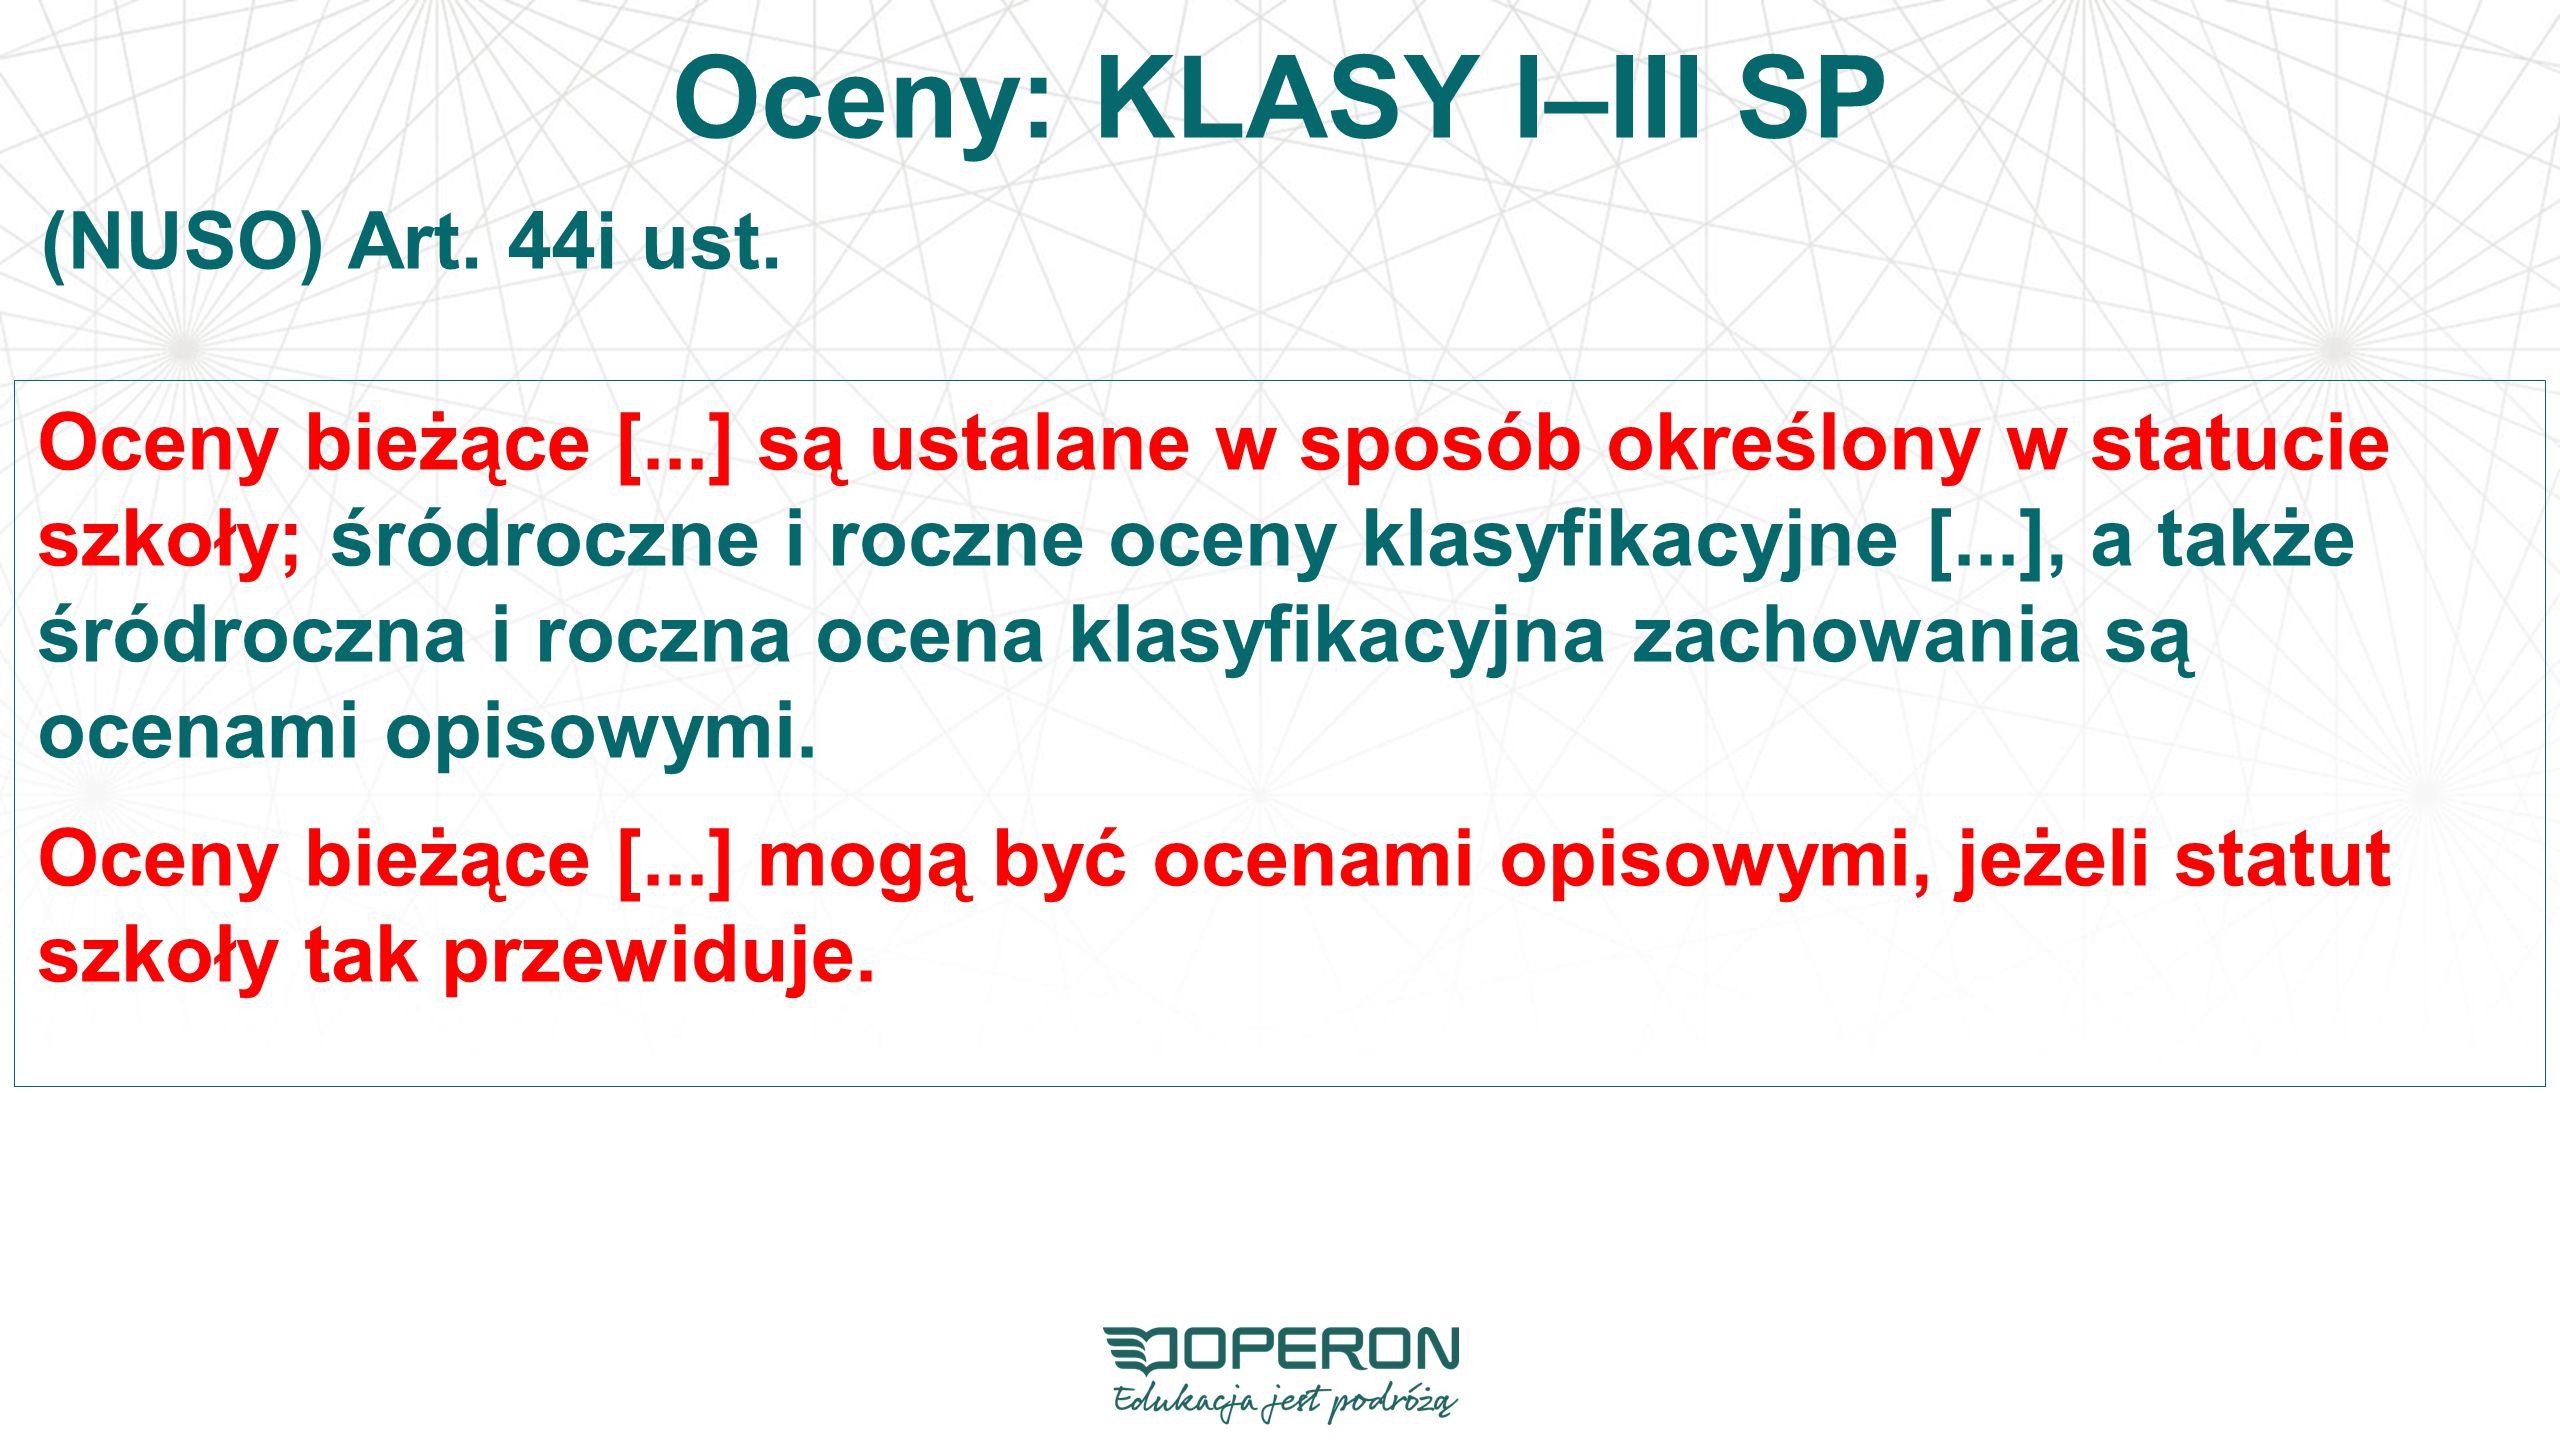 Oceny: KLASY I–III SP (NUSO) Art. 44i ust.